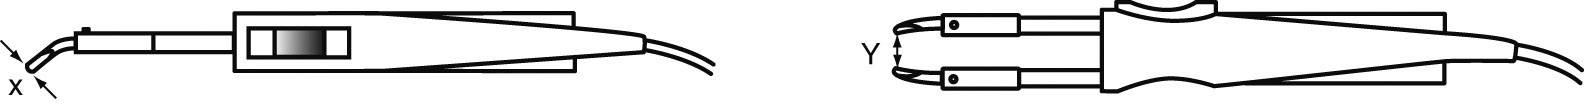 Spájkovací hrot dlátová forma Weller Professional WTA-4, velikost hrotu 12.5 mm, 2 ks